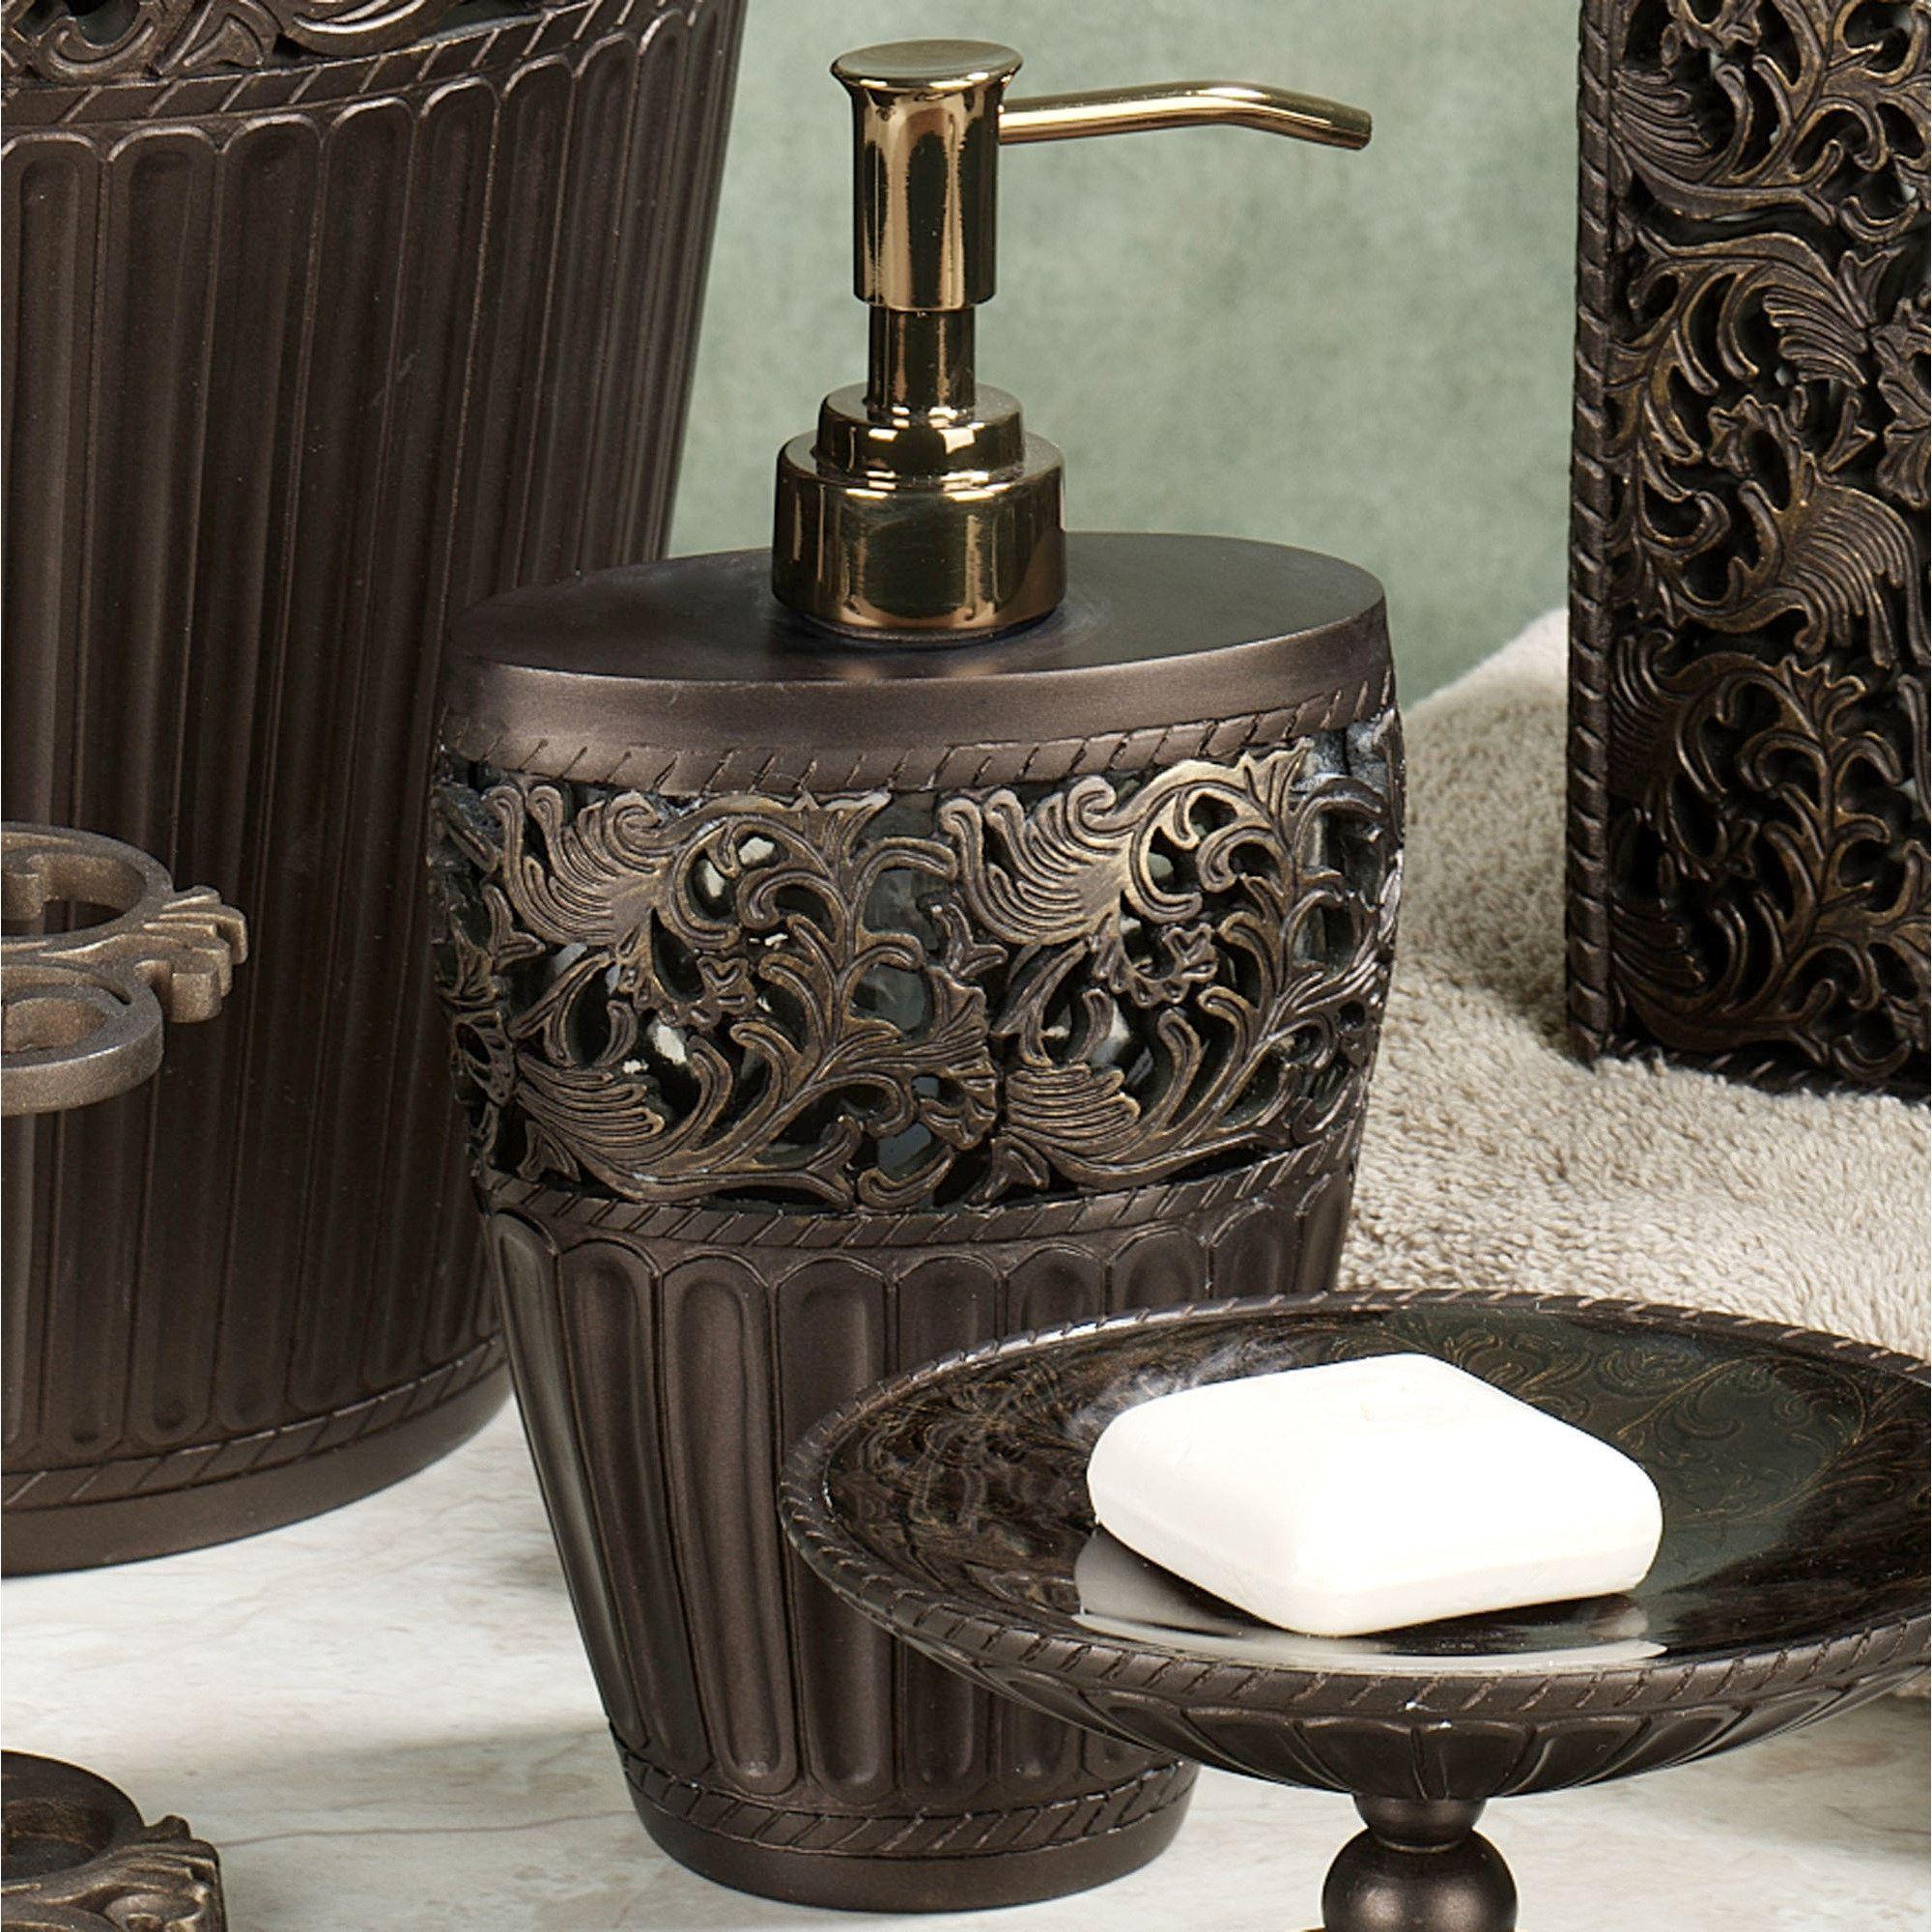 Marrakesh Bath Accessories By Croscill - Croscill bathroom sets